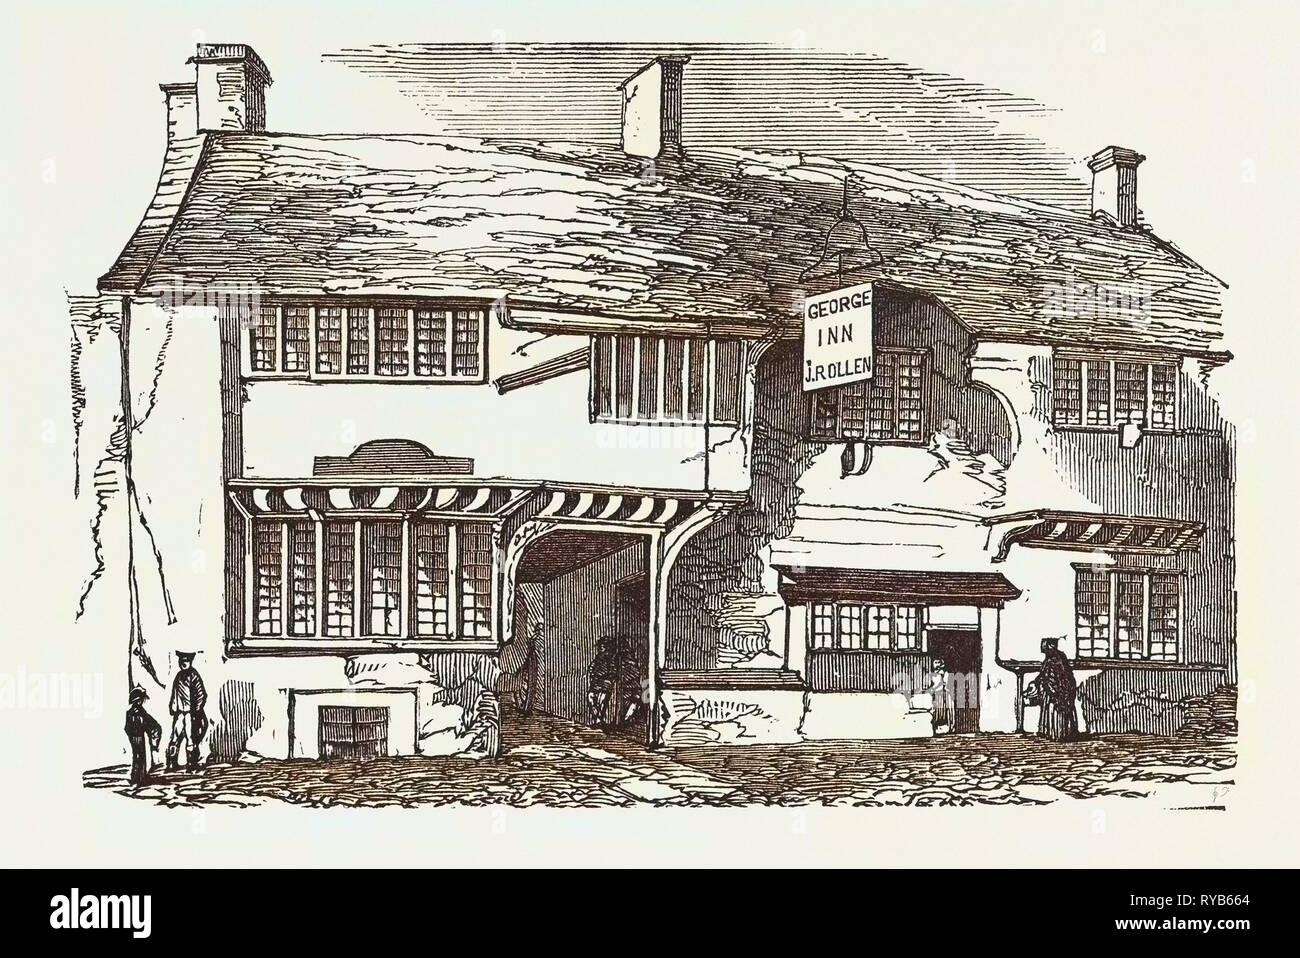 The Old George Inn, Yeovil, 1853 - Stock Image